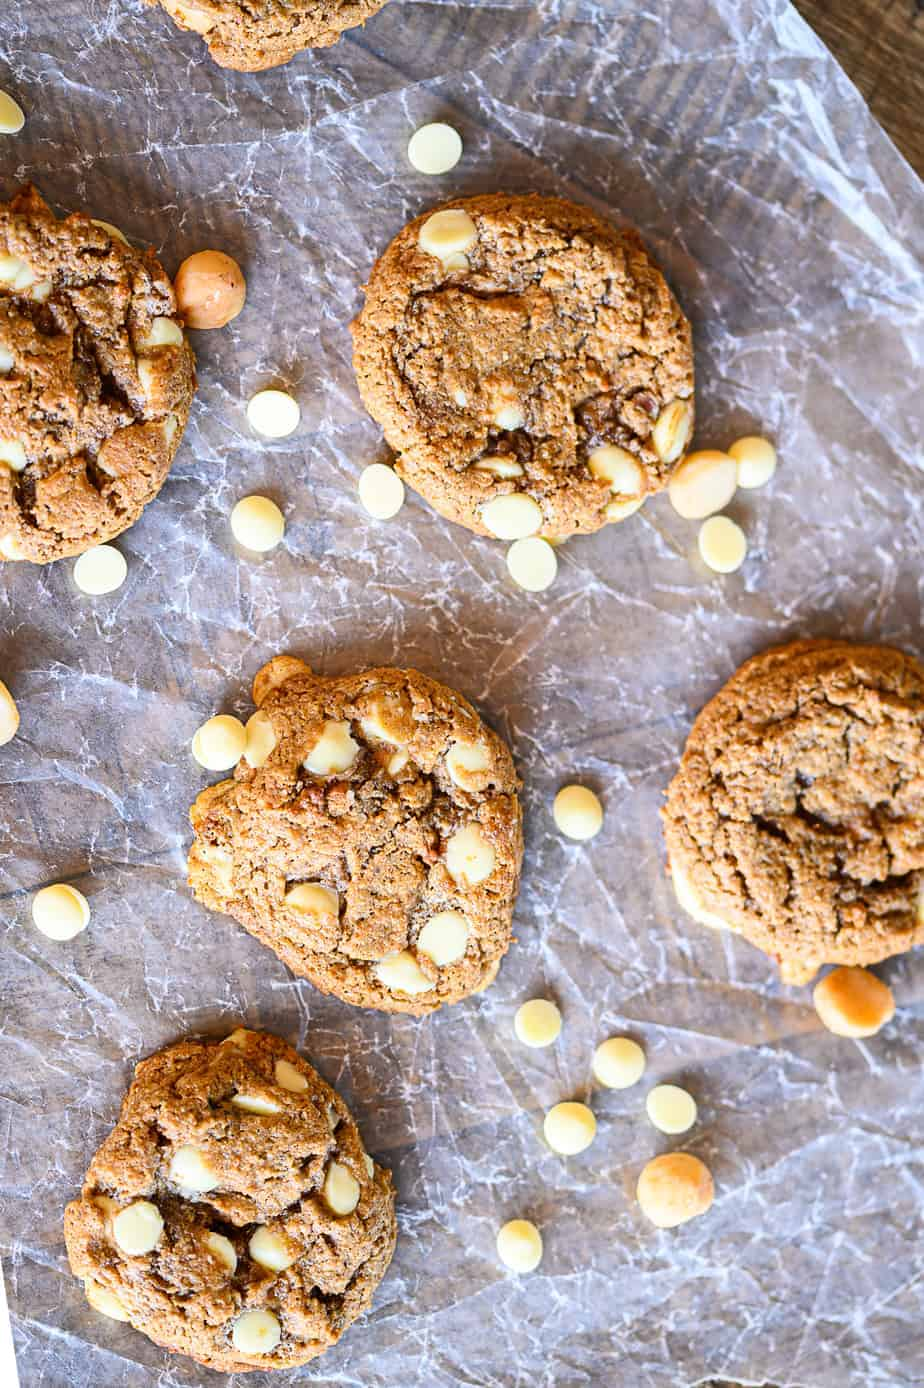 white chocolate macadamia nut cookies on wax paper